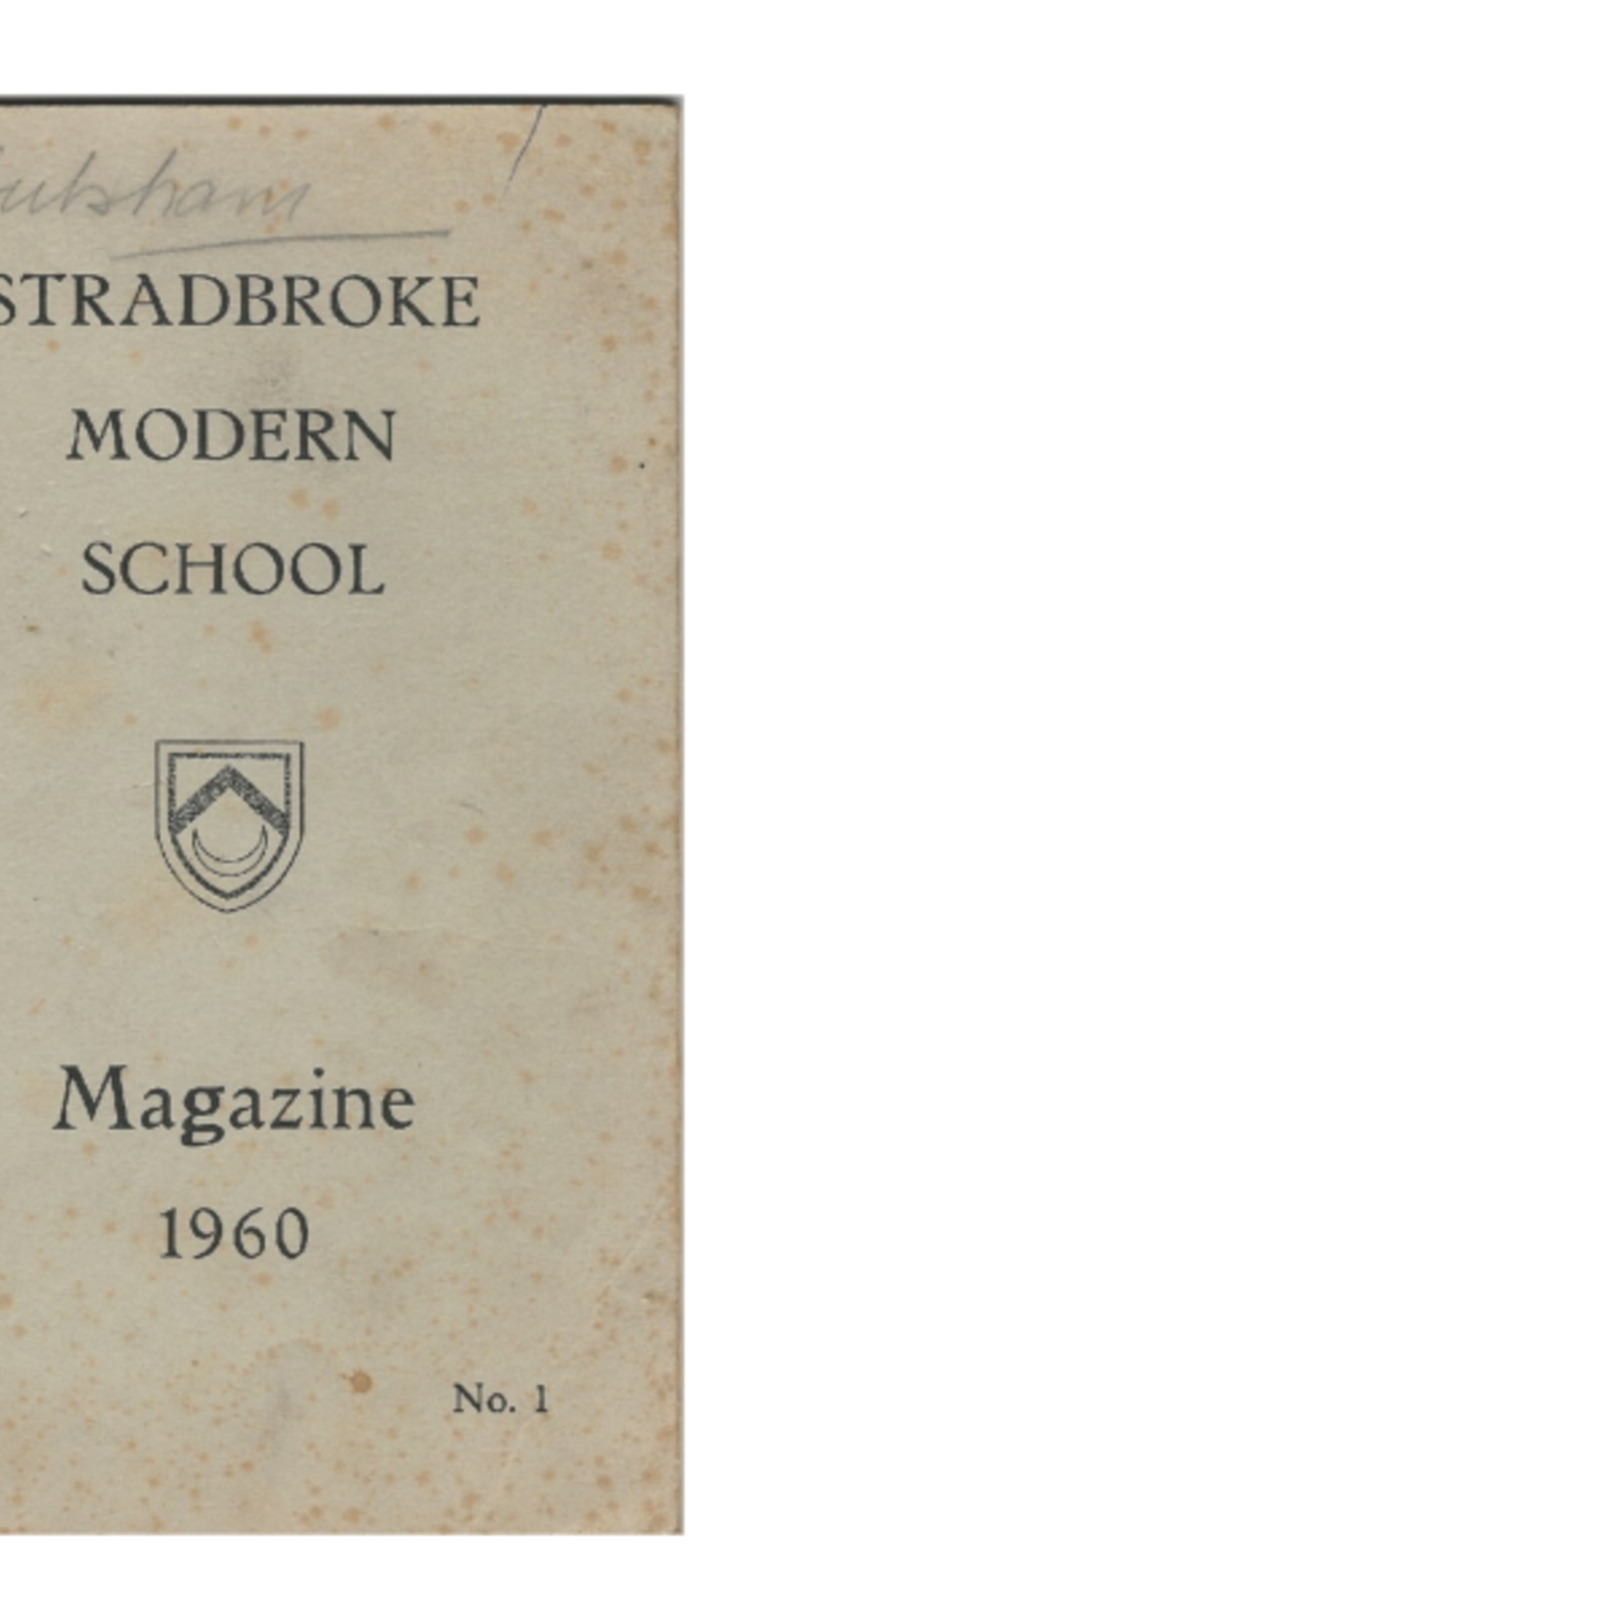 STRADBROKE HIGH SCHOOL MAG 1960 PART ONE.pdf